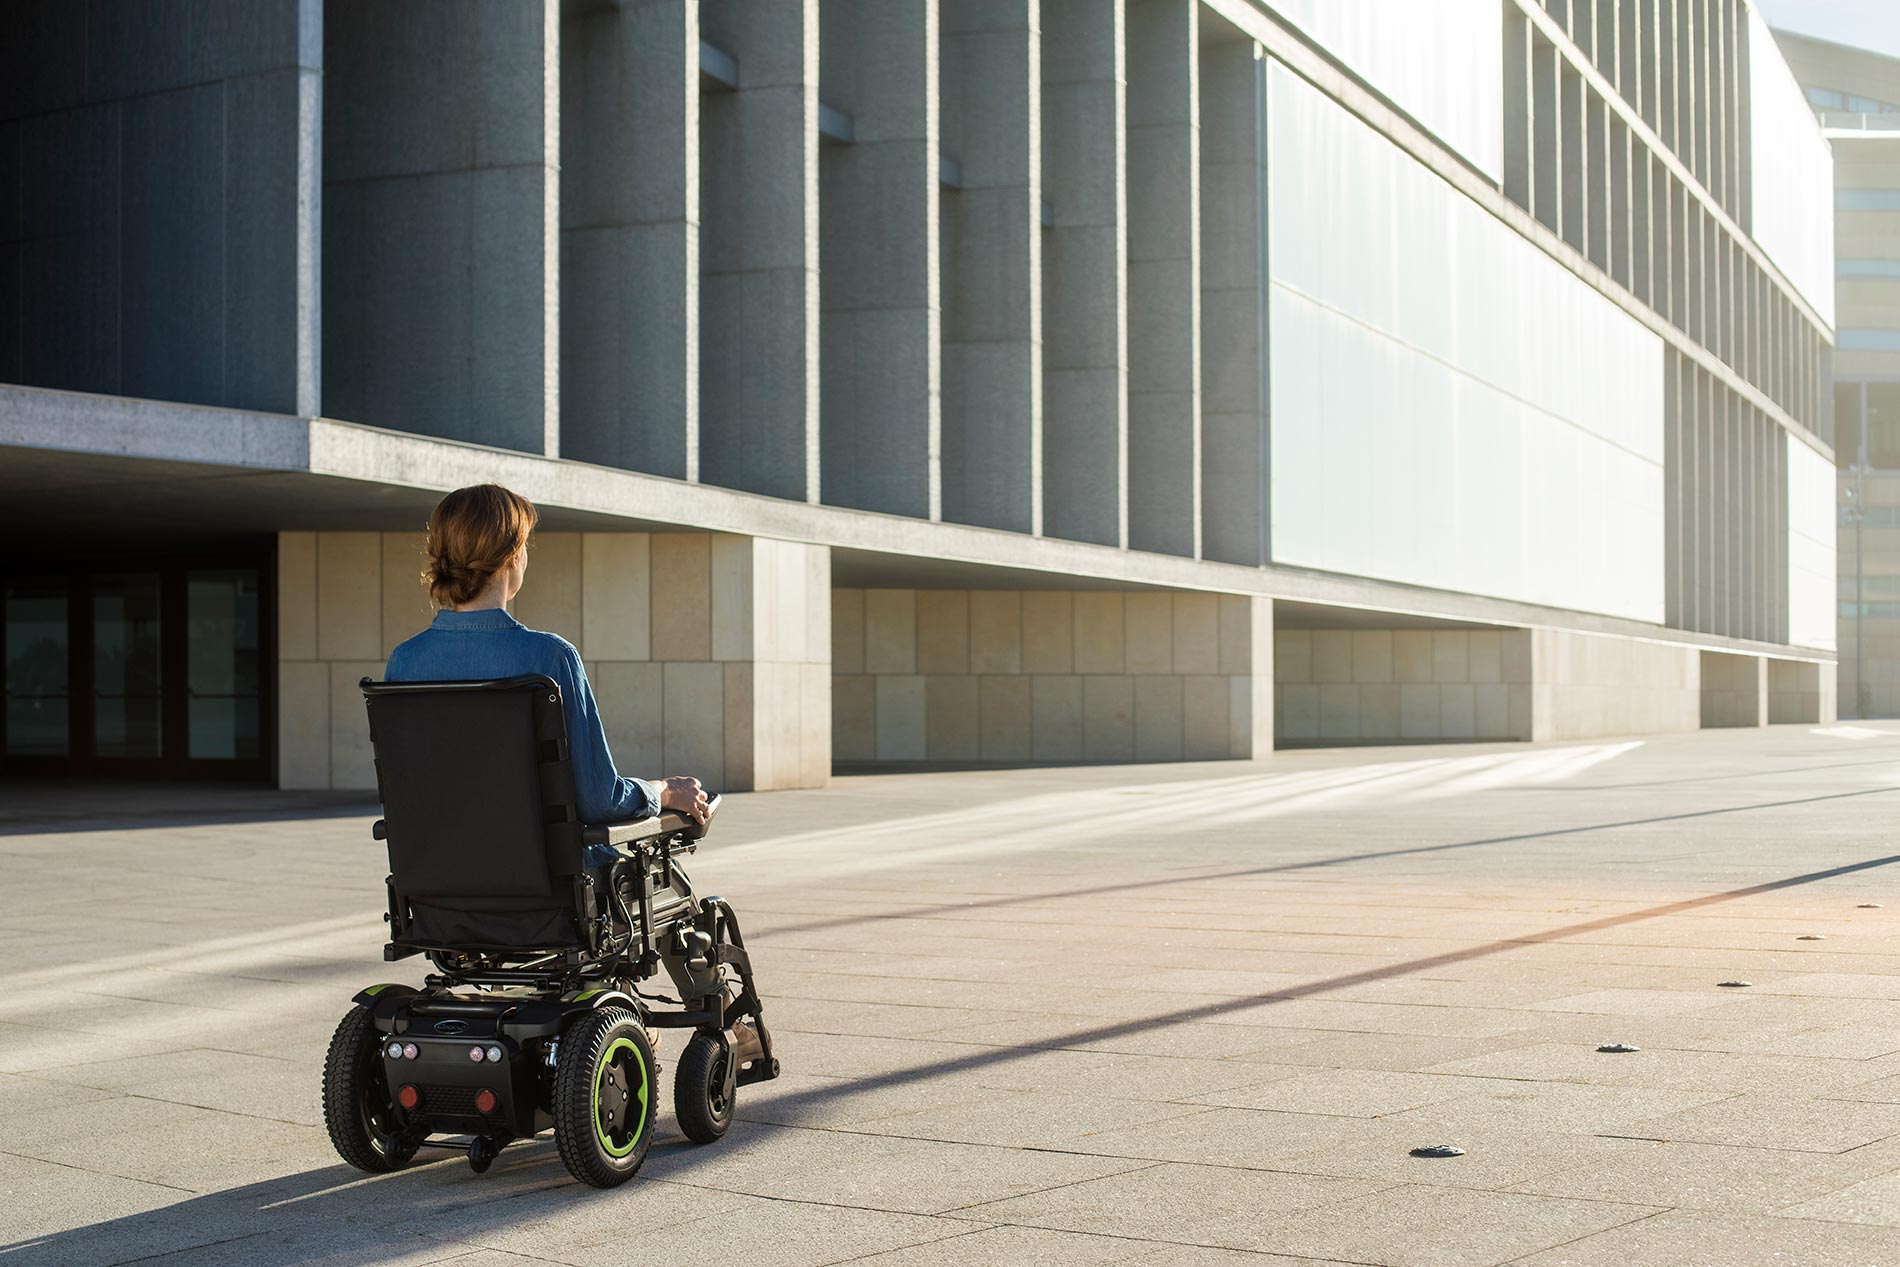 Sunrise medical sillas ruedas Q100-200